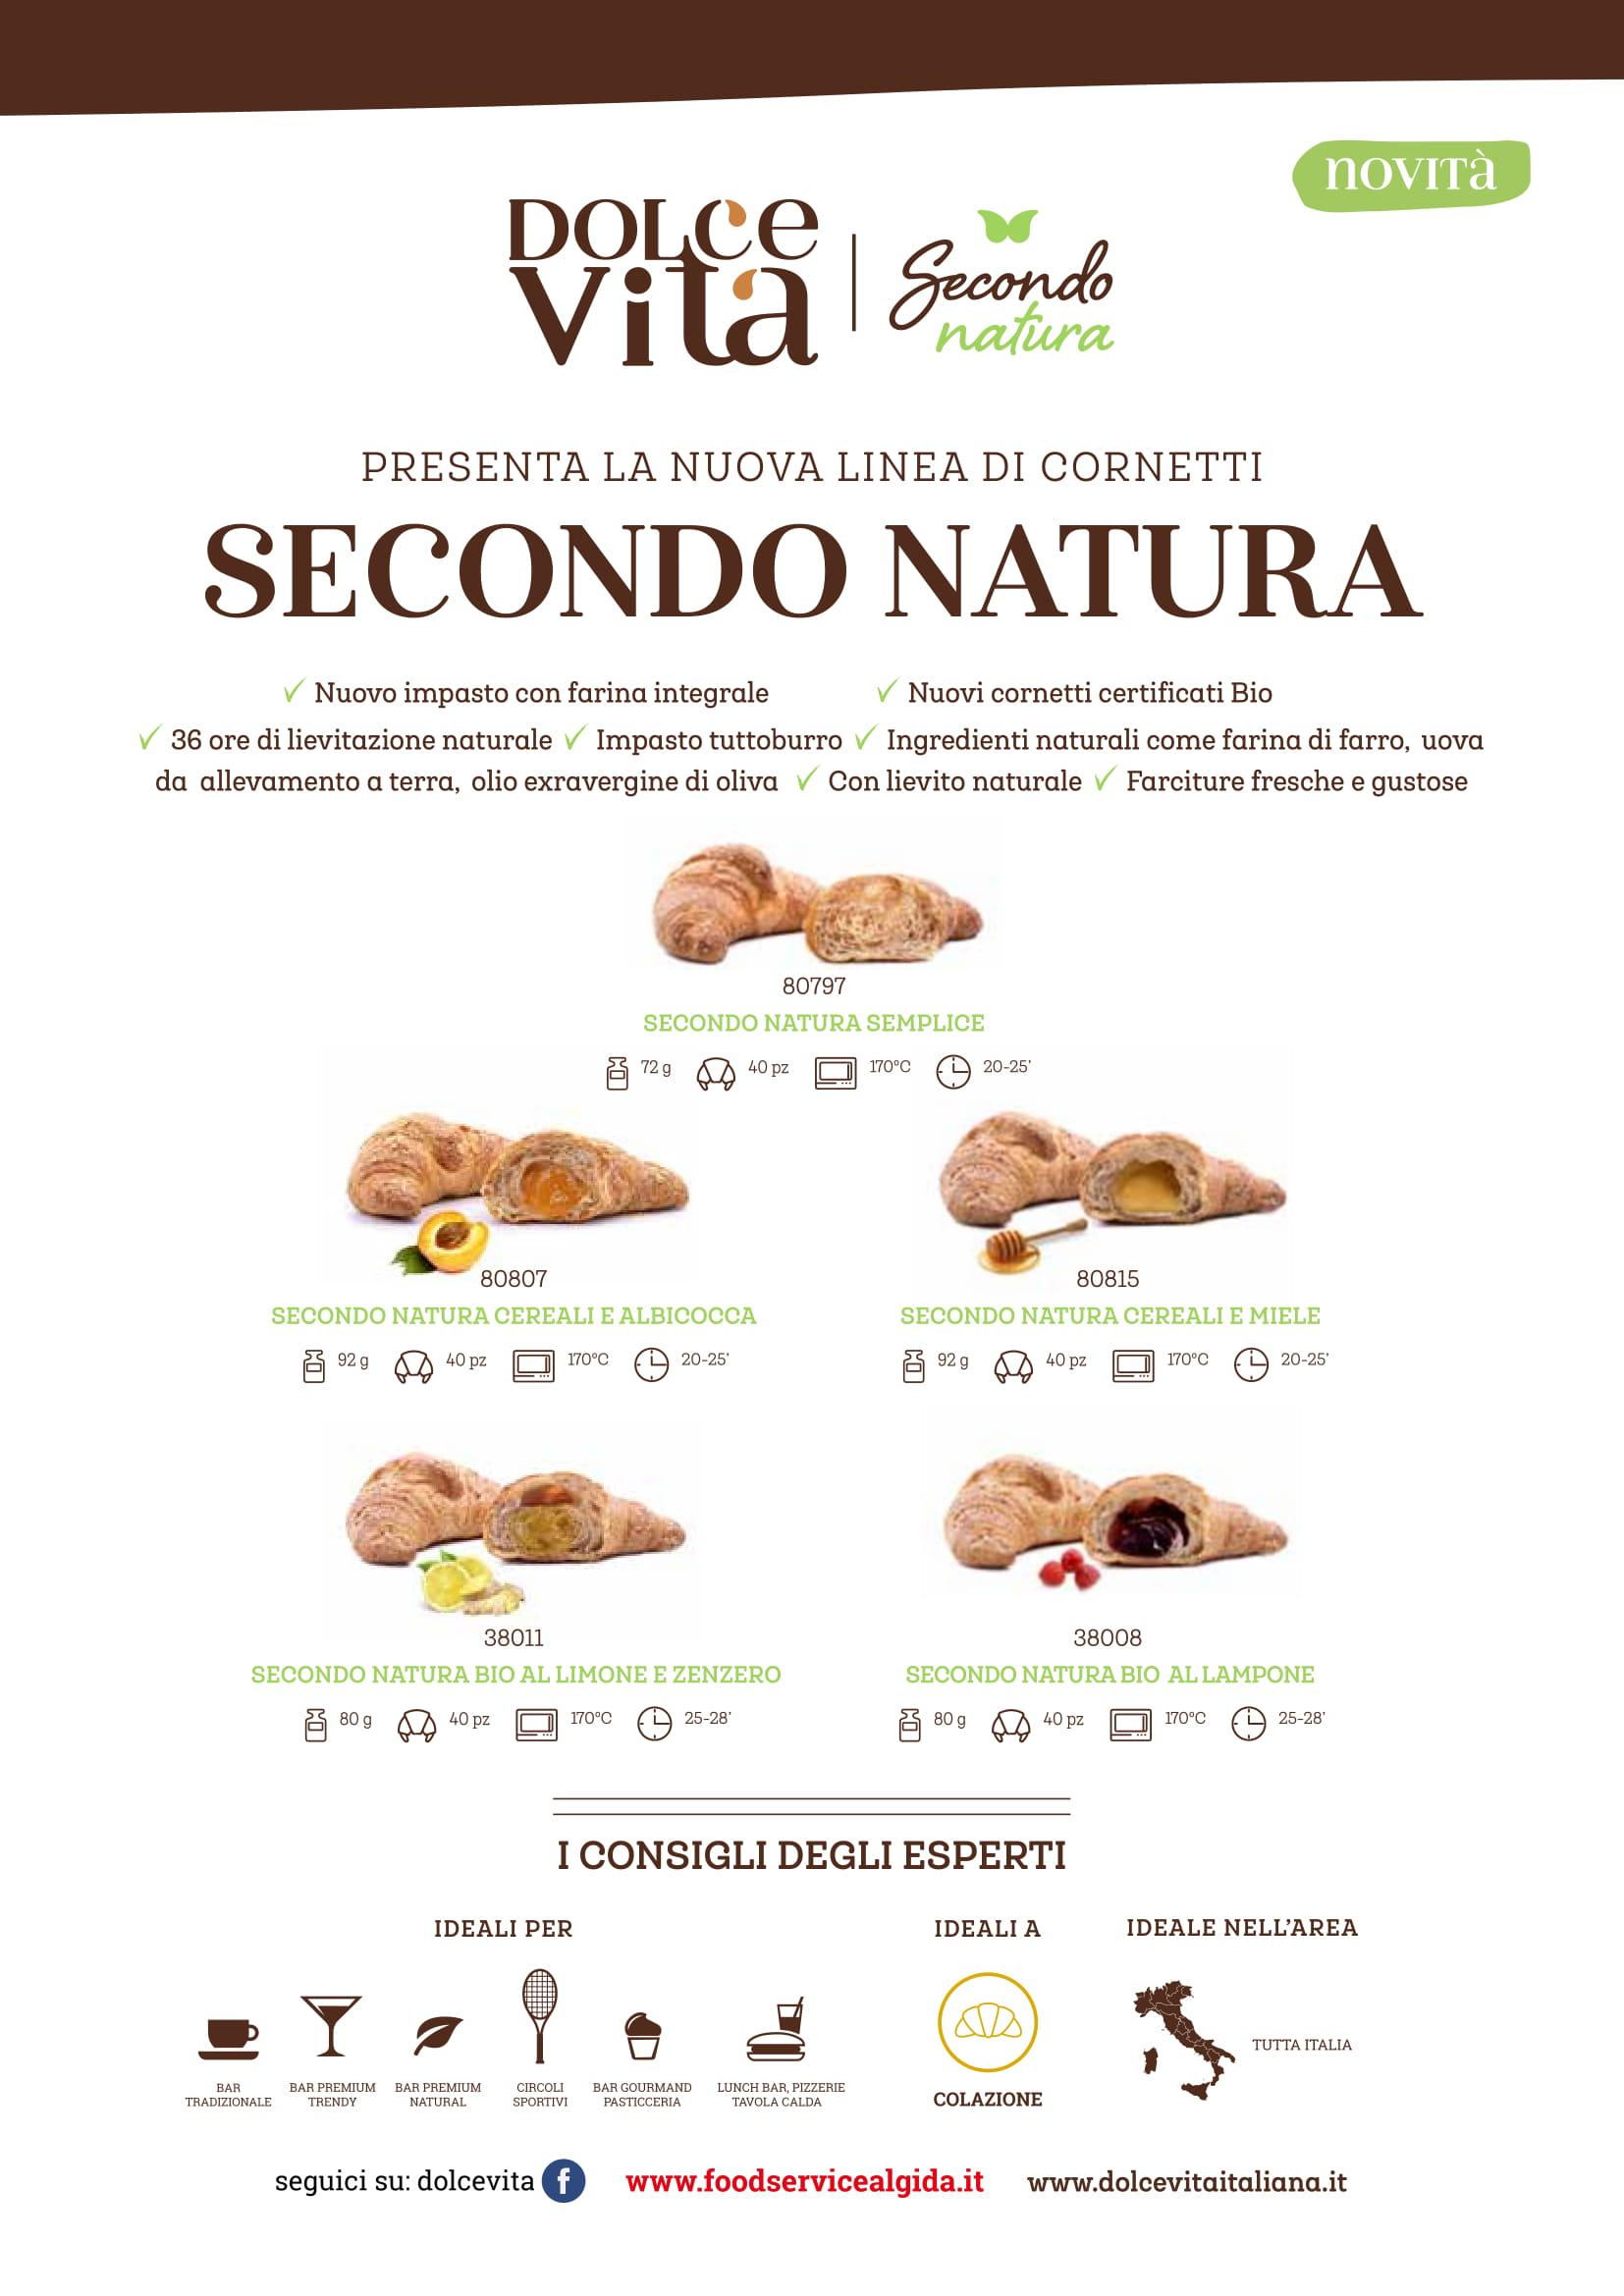 A4_ViancaVolta_Secondo Natura_bassa-2